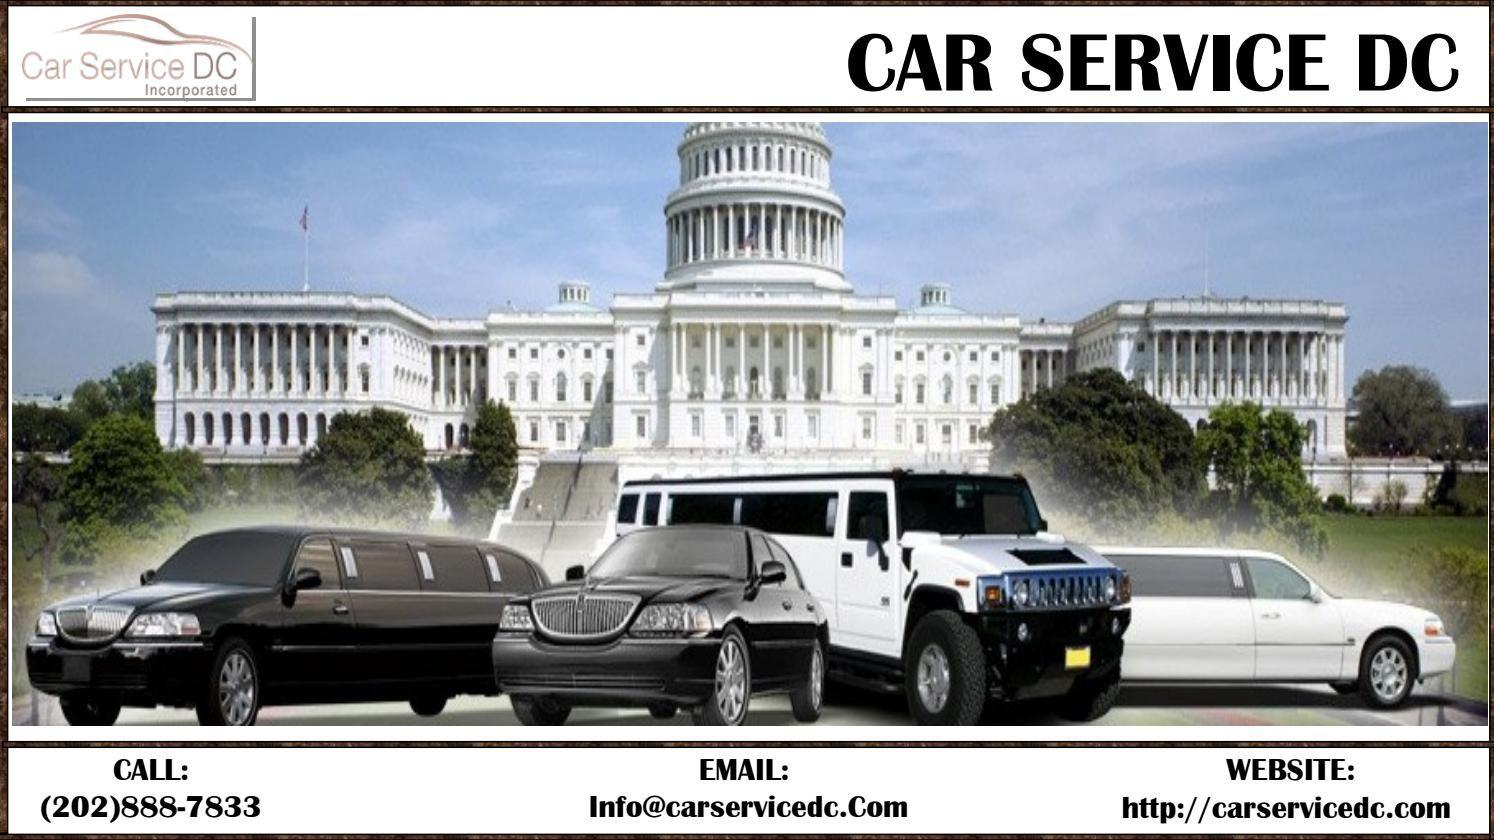 East Coast Car Service